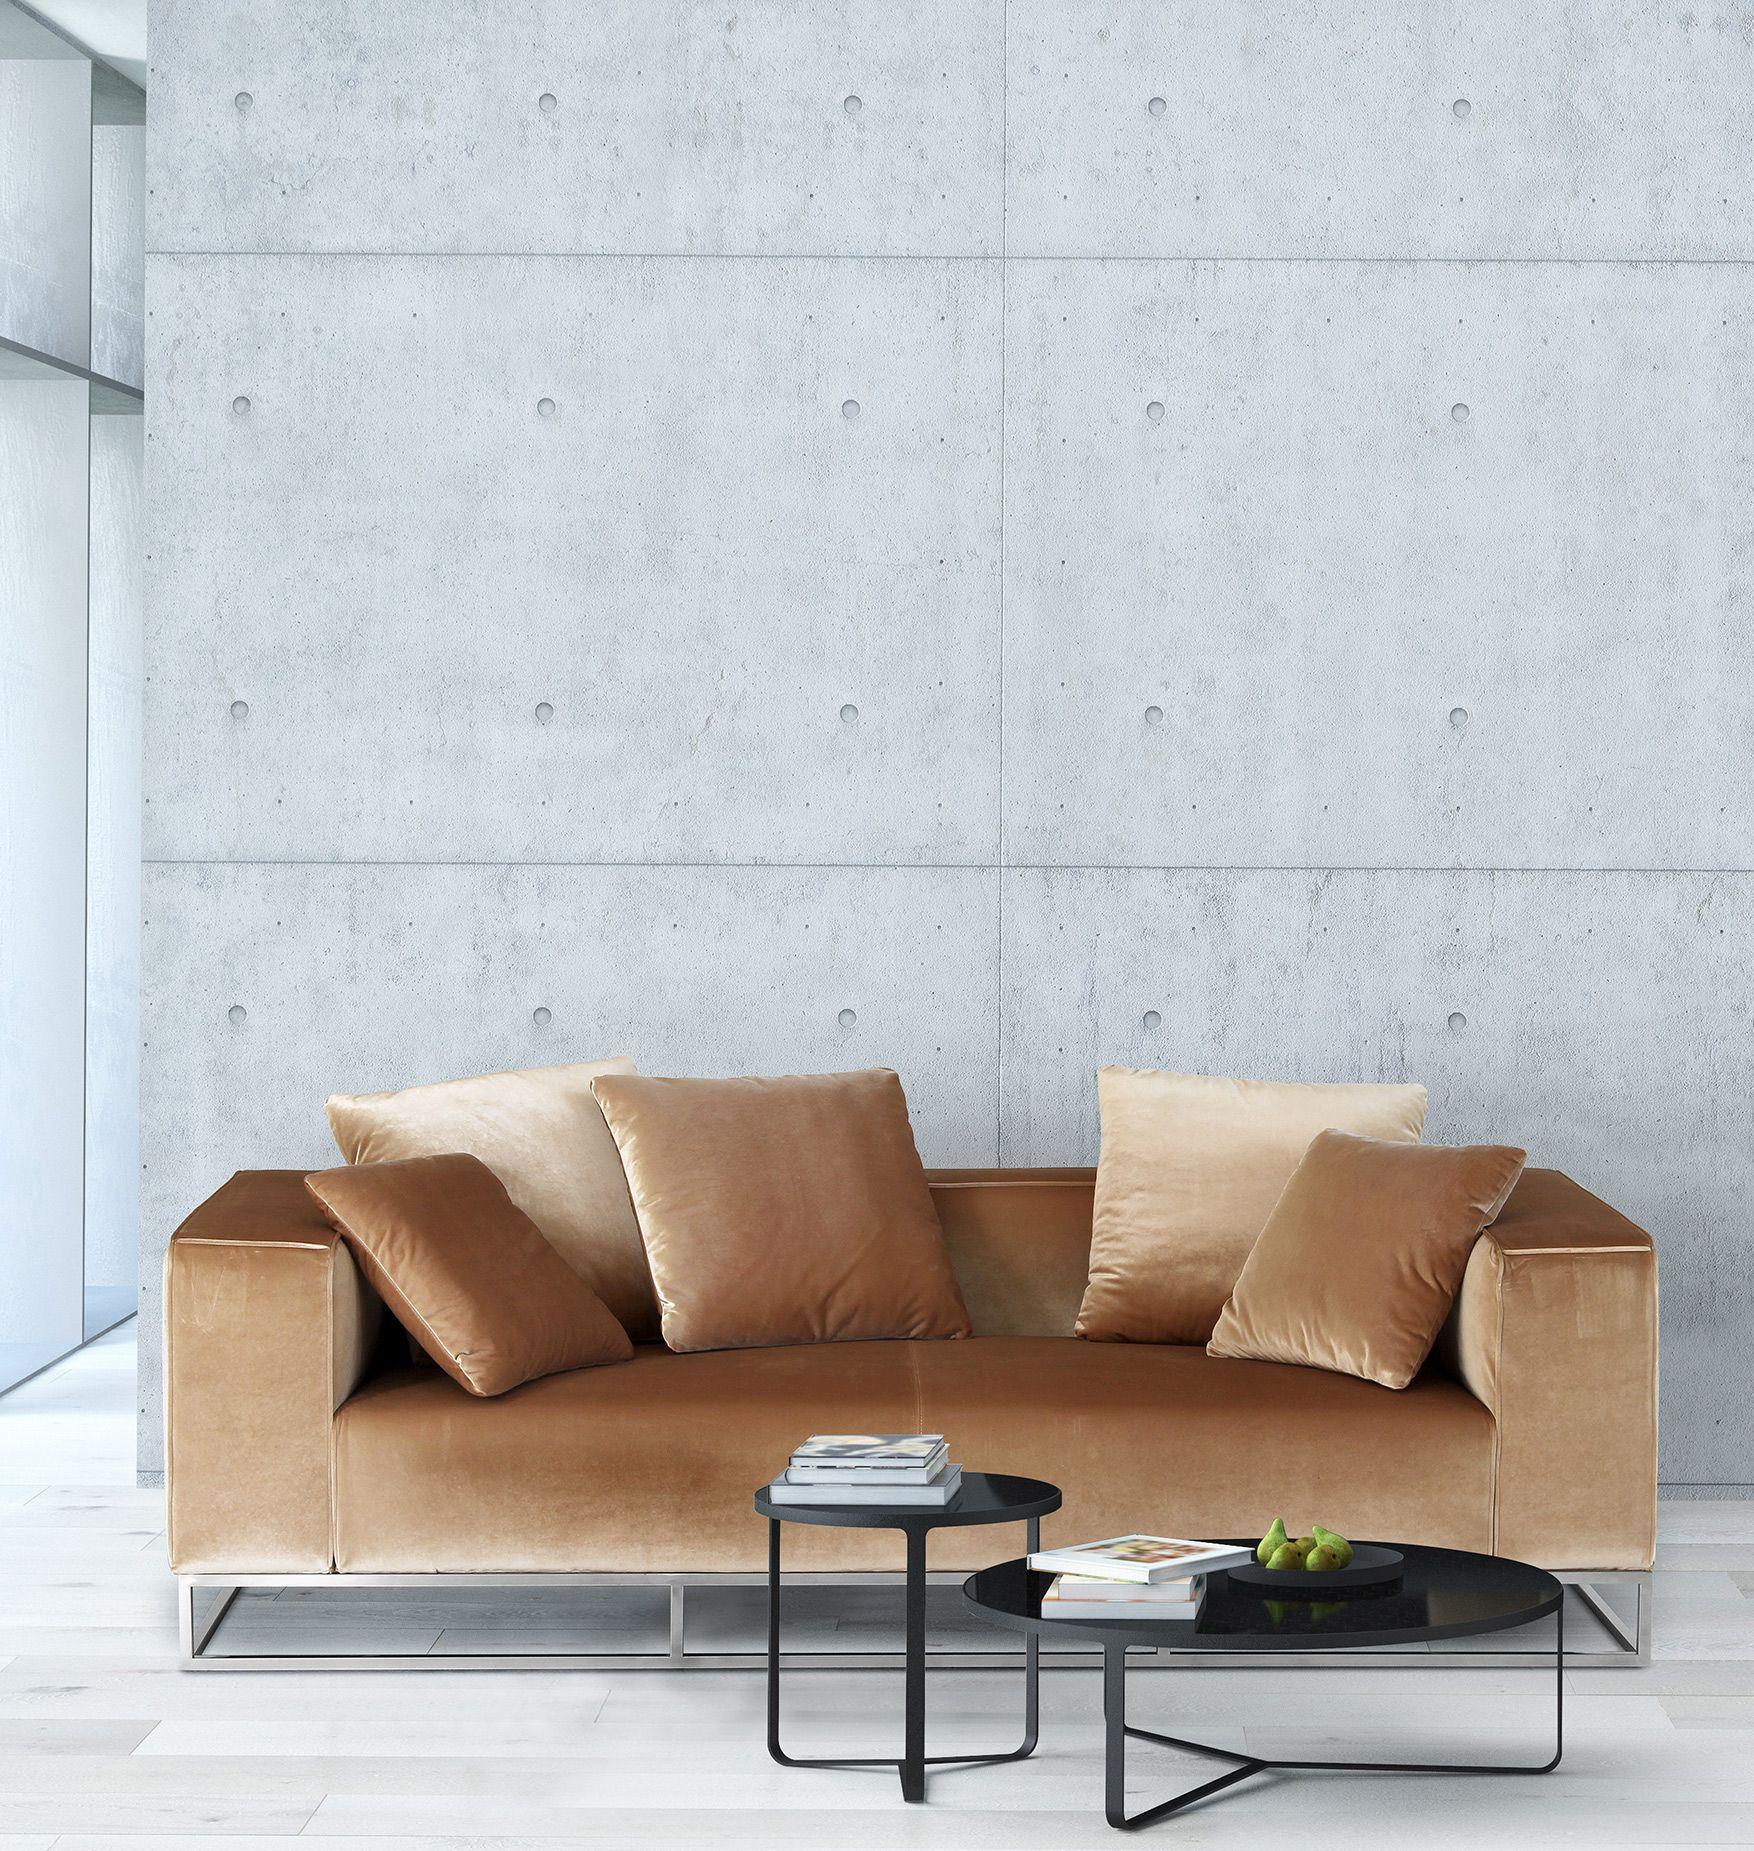 octopus sofa hamburg. Black Bedroom Furniture Sets. Home Design Ideas